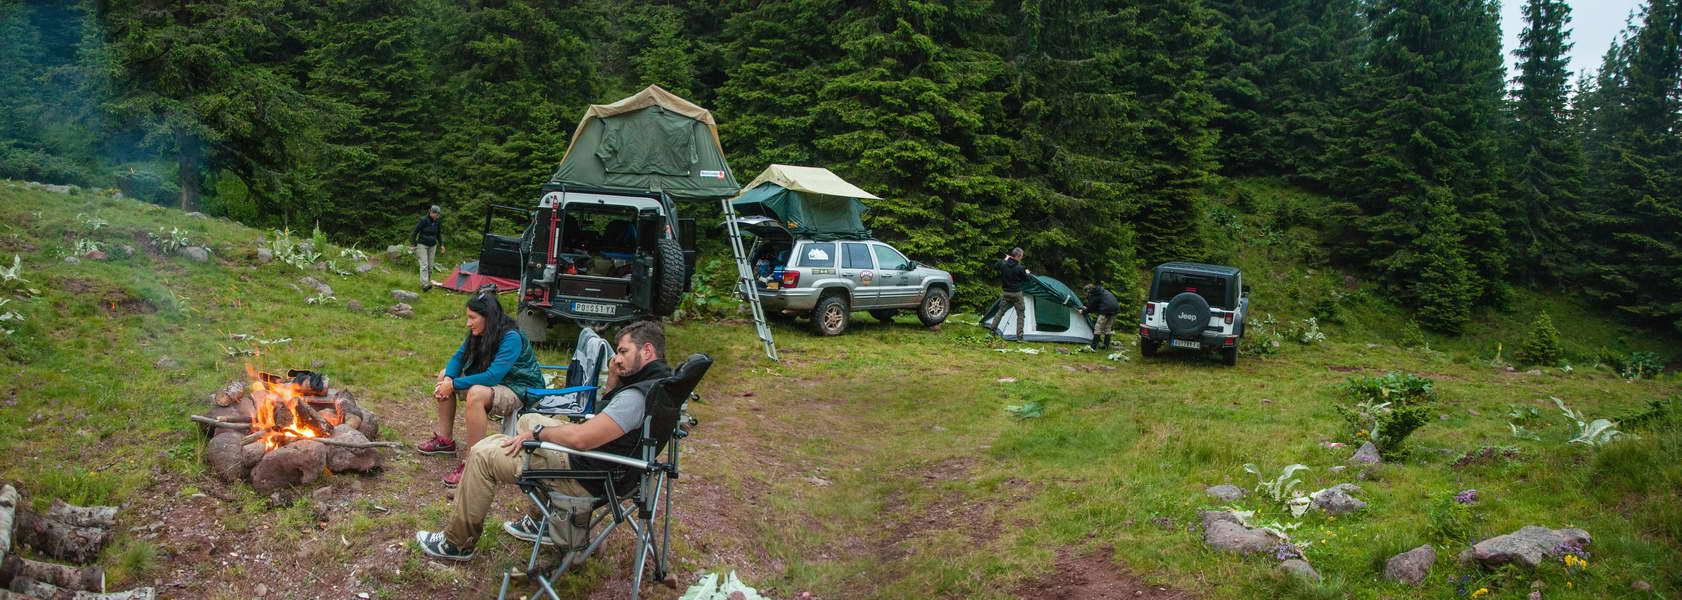 Naš kamp druge noći ispod Beleđa